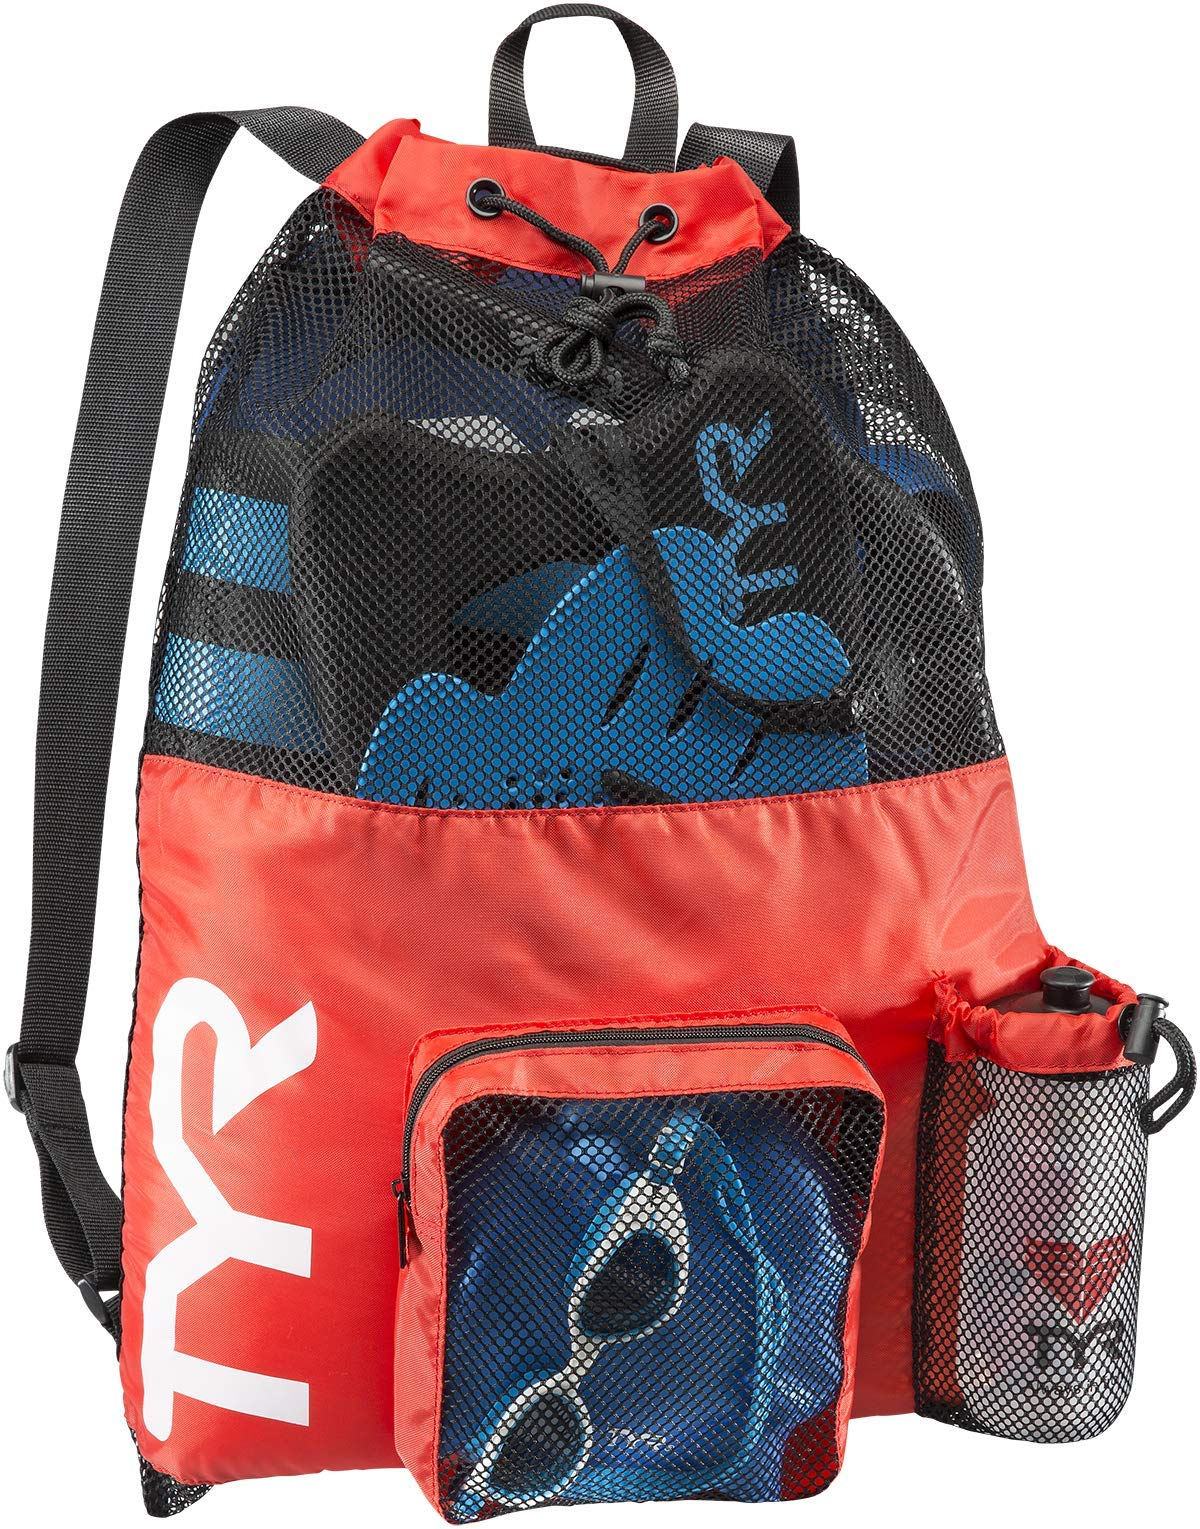 TYR Big Mesh Mummy Backpack, Red